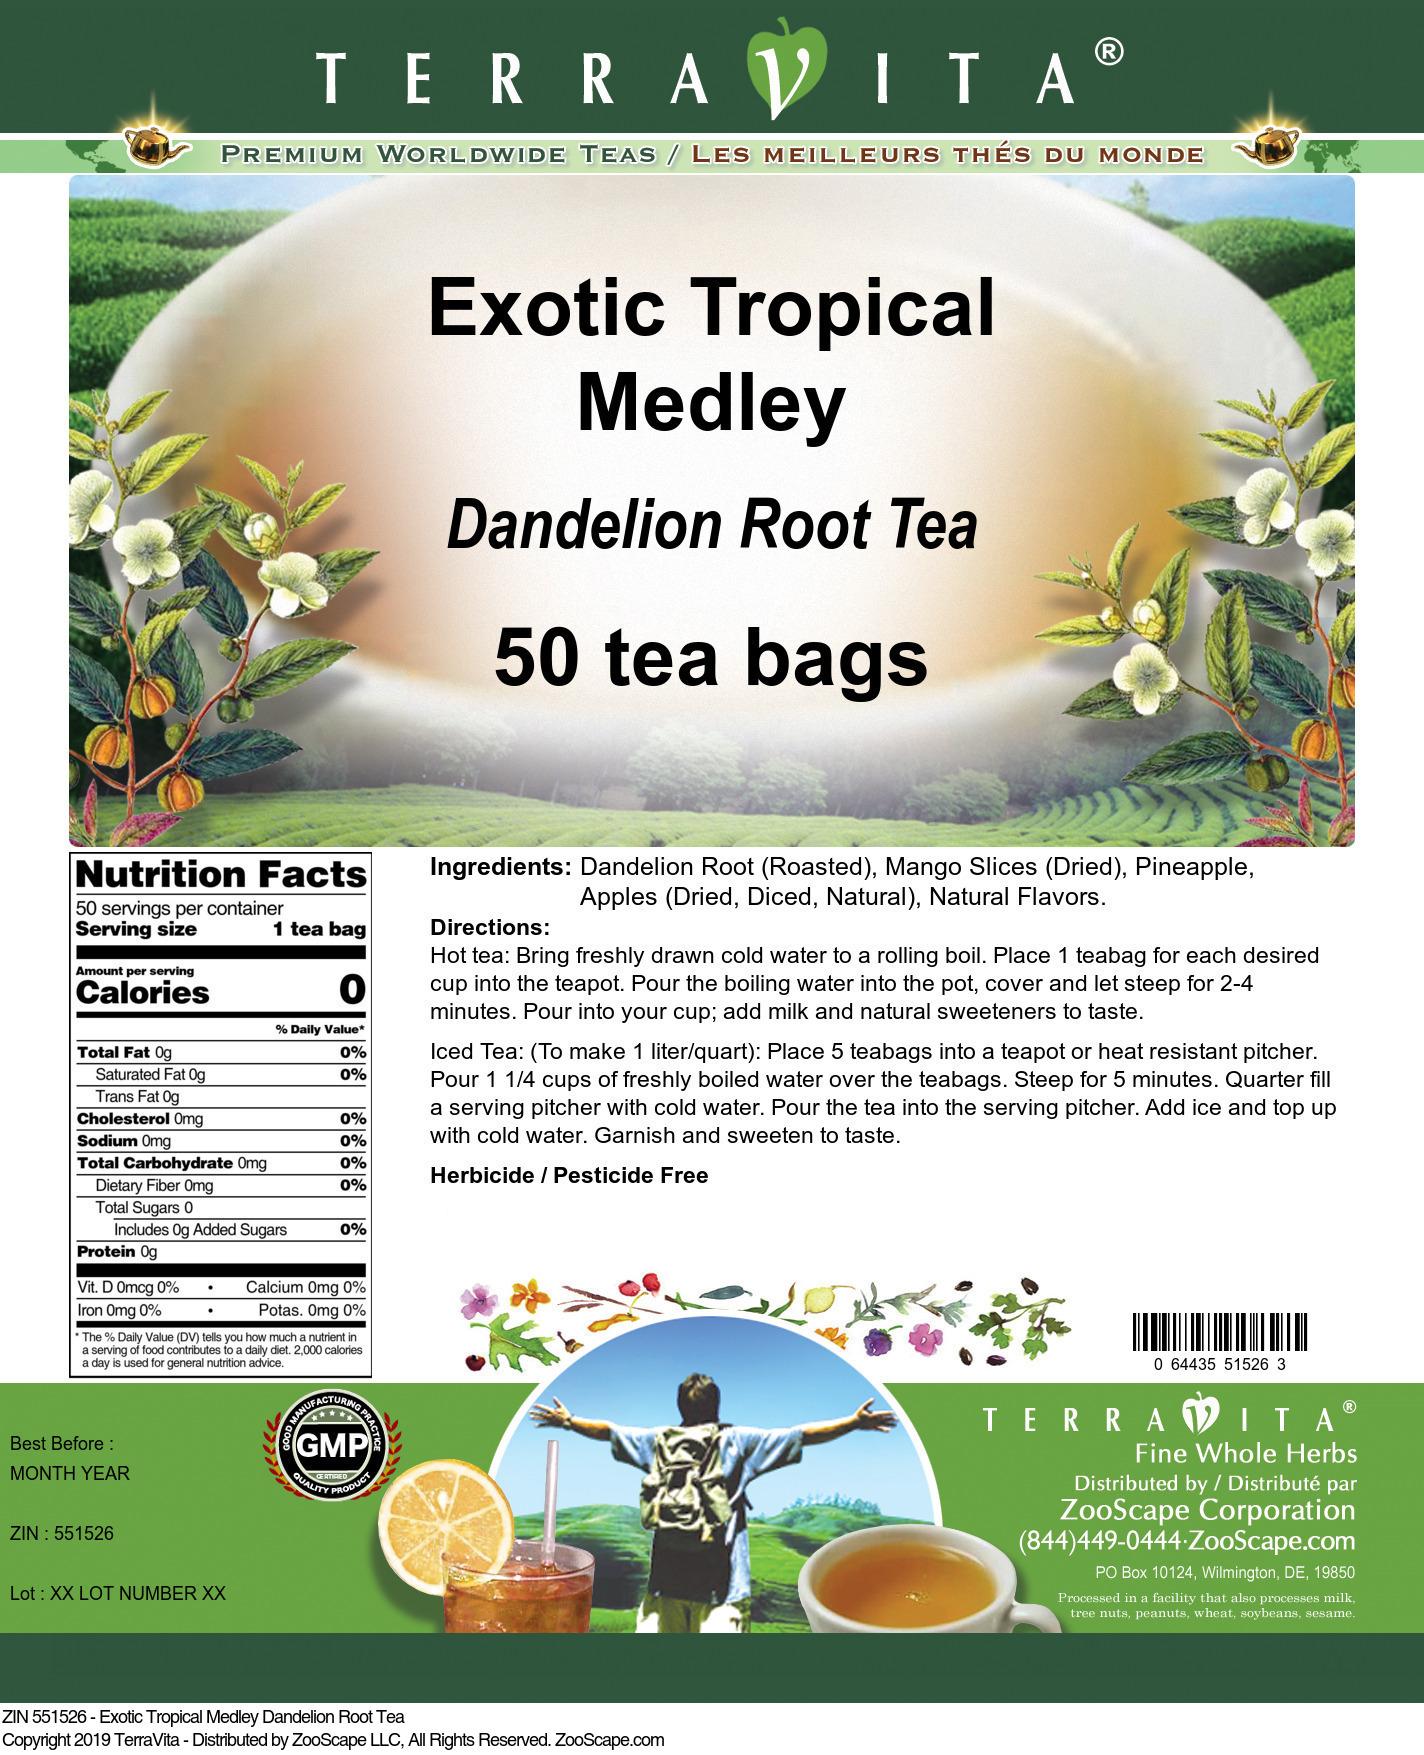 Exotic Tropical Medley Dandelion Root